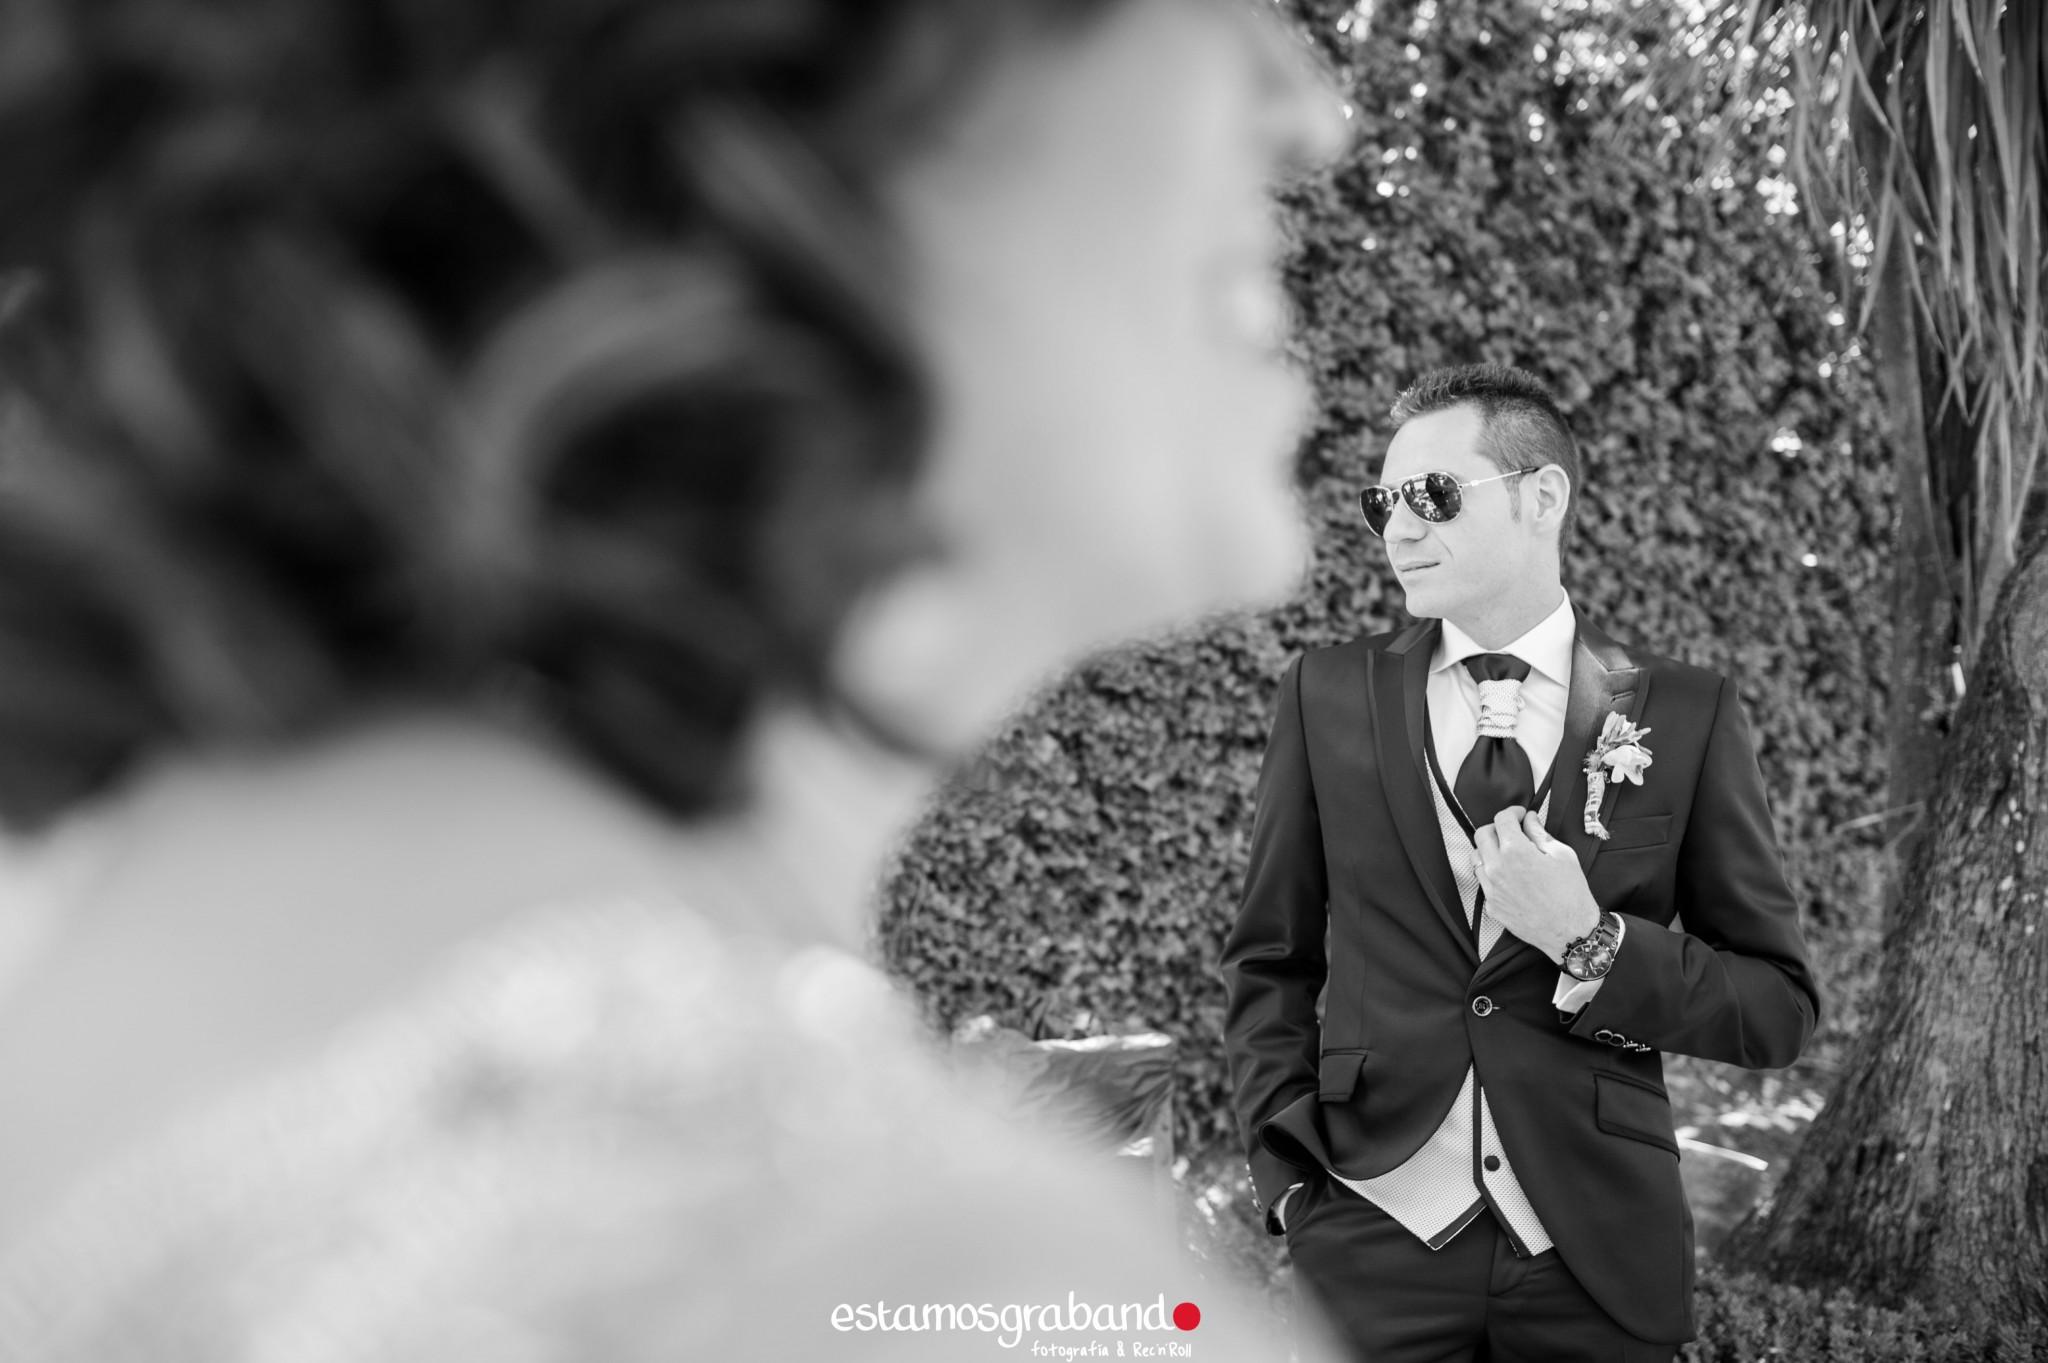 LEO-Y-PEDRO-19 Fotografía de Boda_Leo & Pedro [Jardines de la Mamunia, Granada] - video boda cadiz